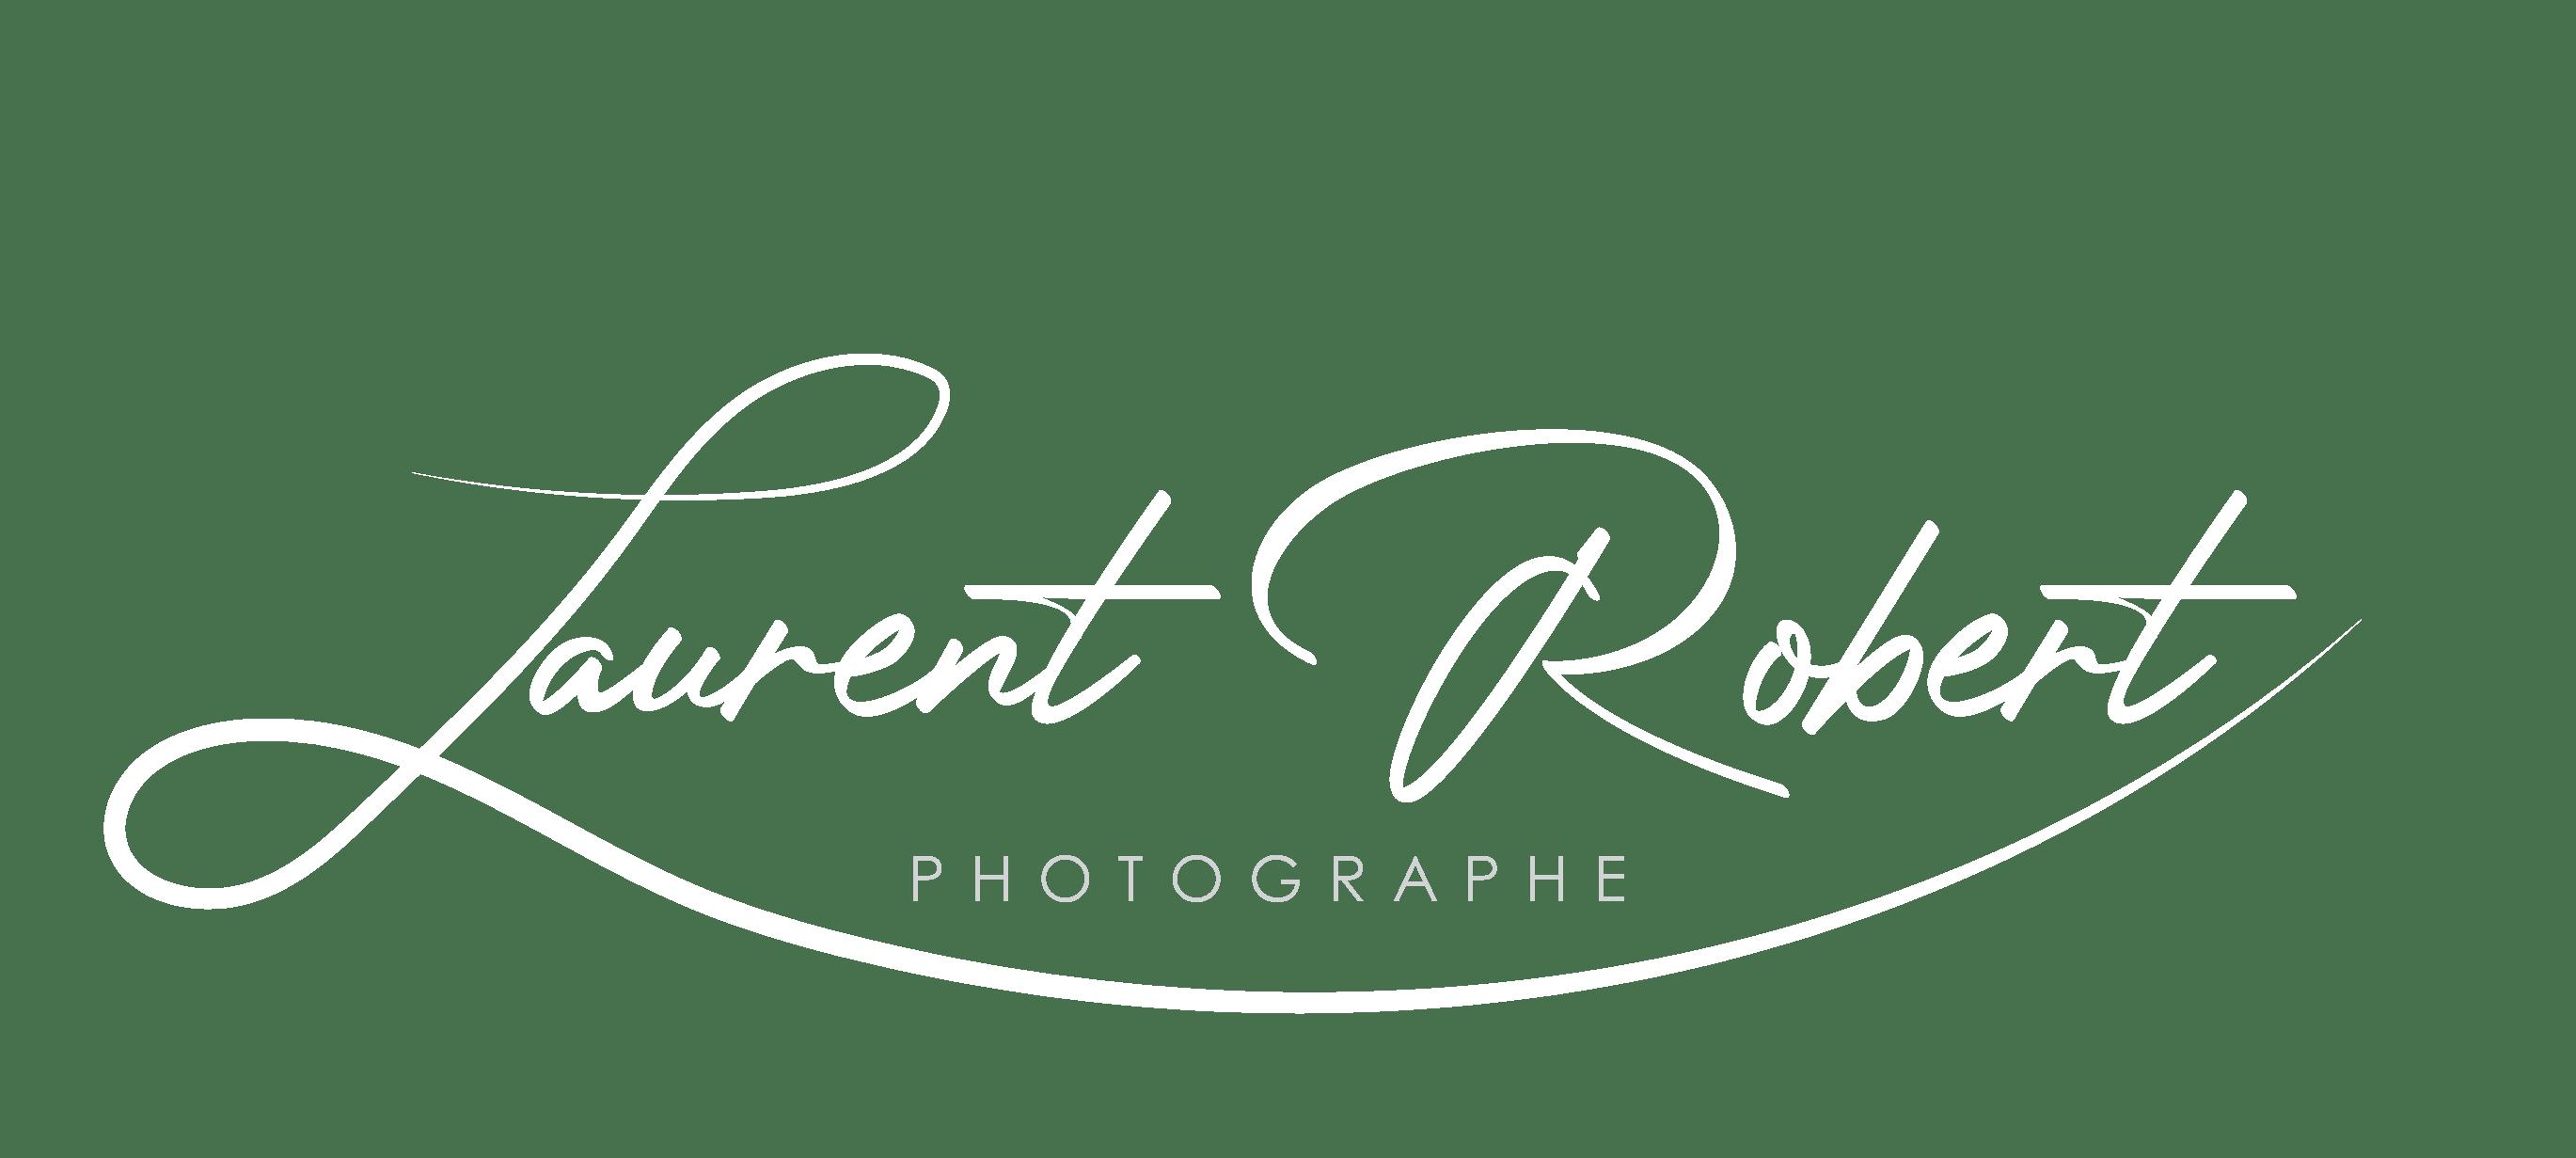 Laurent Robert photographe